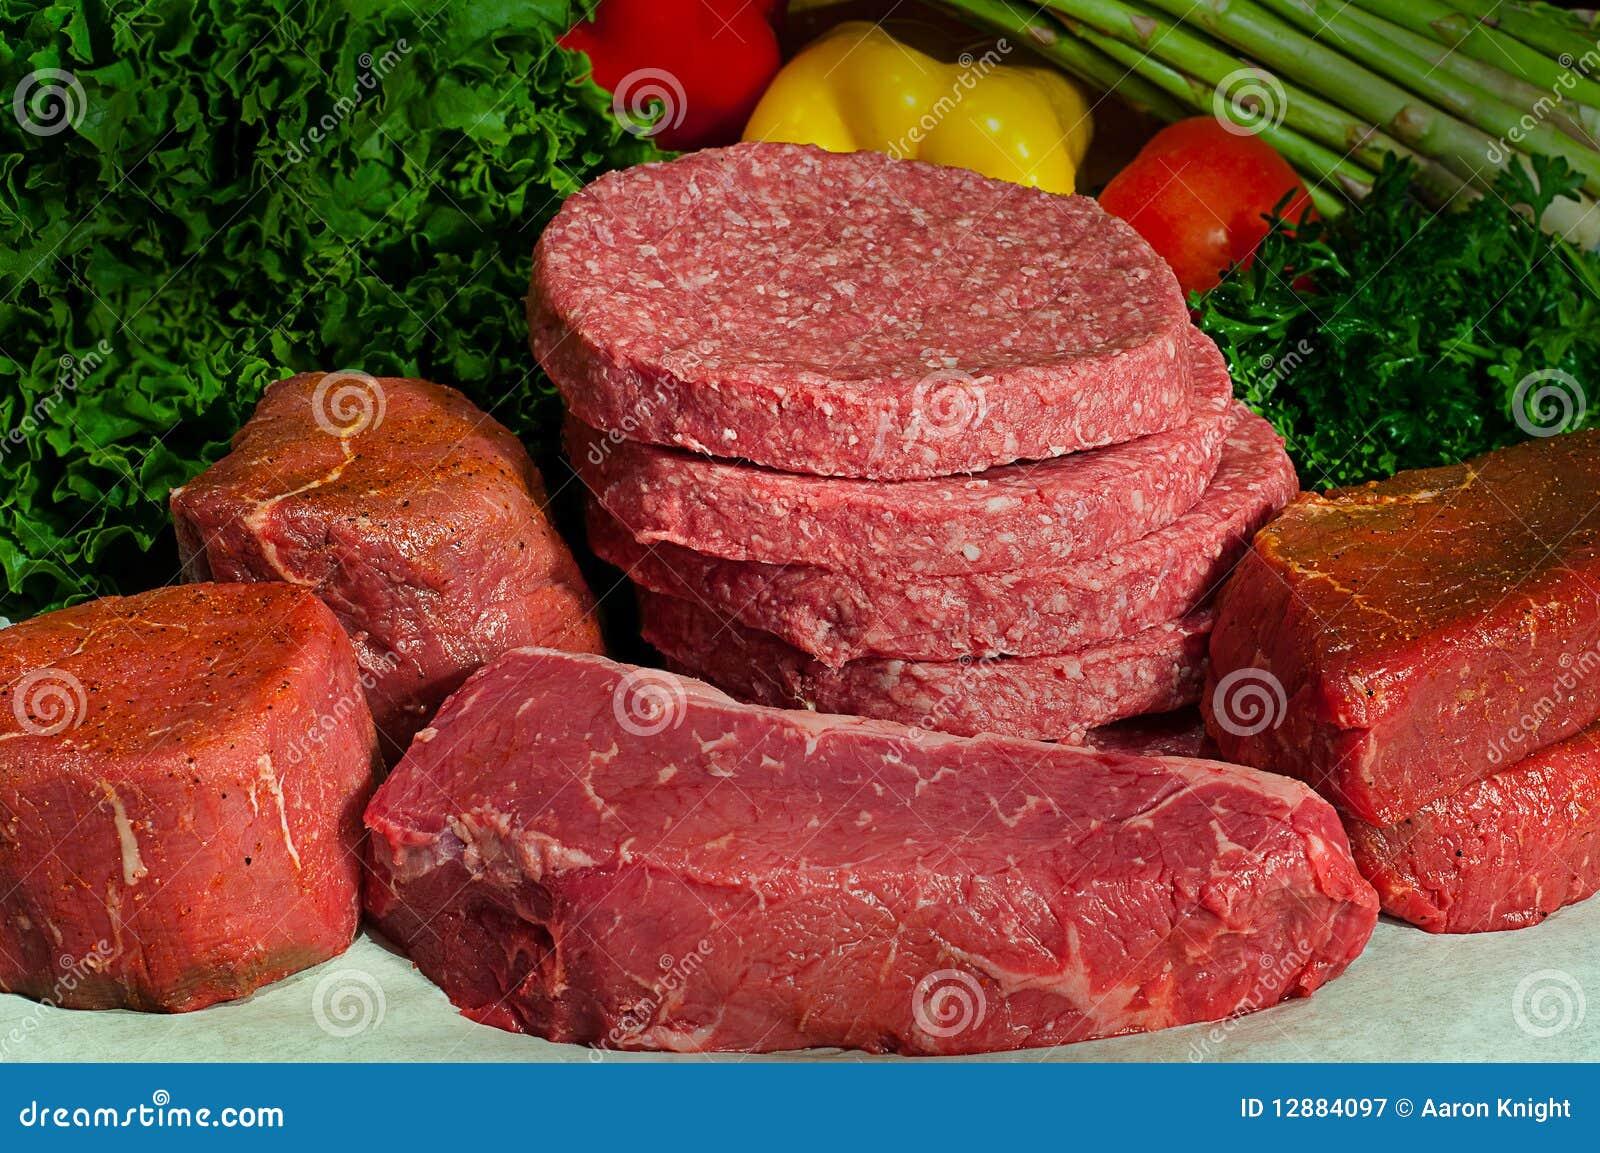 Fresh Butcher Block Raw Beef for Steak House